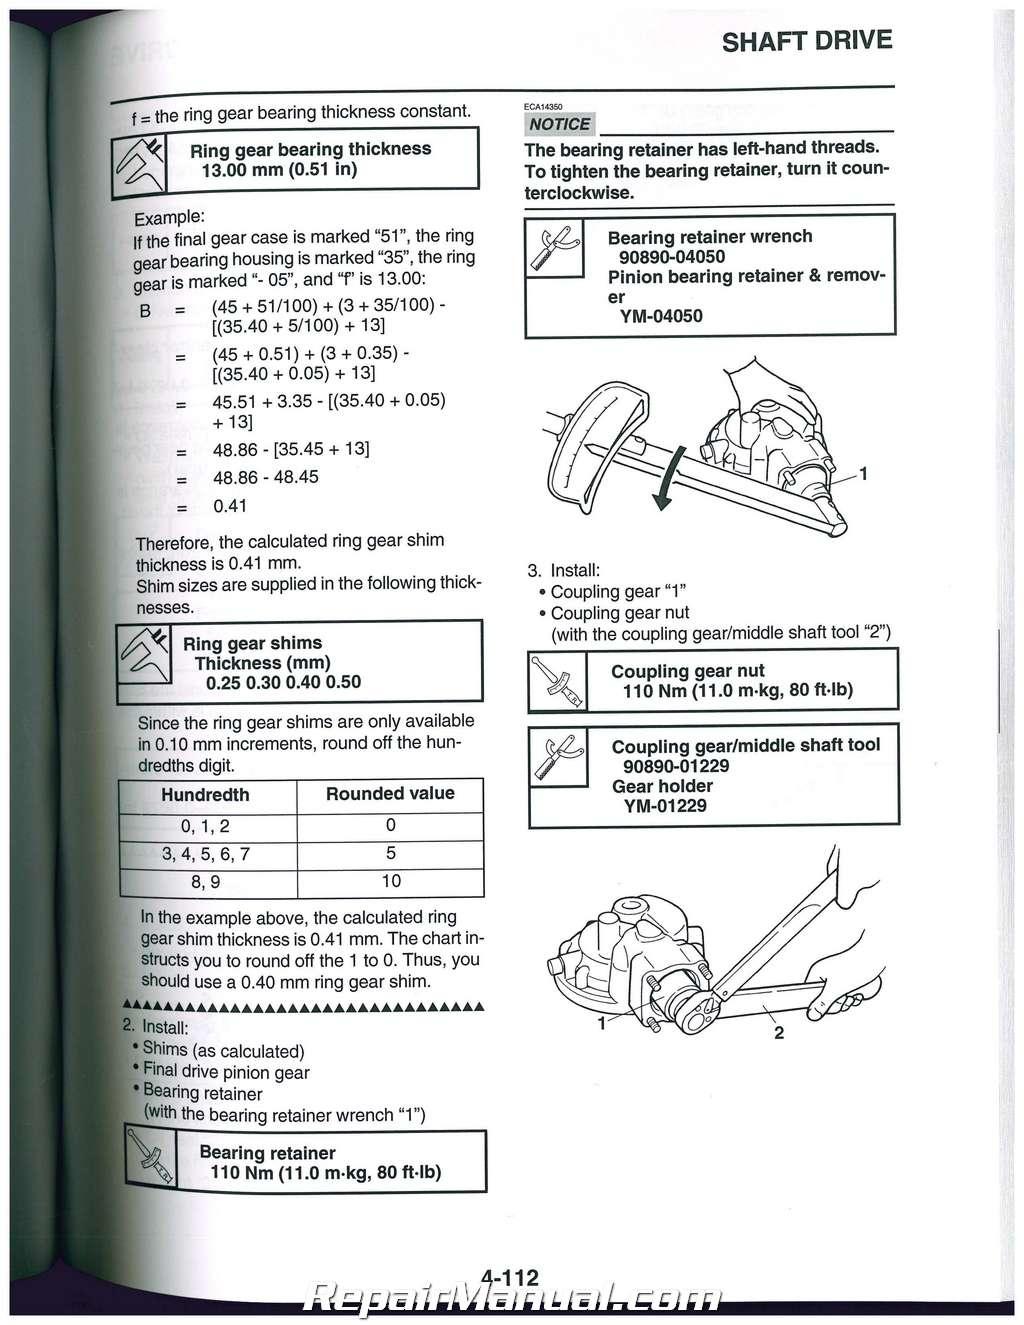 Yamaha fjr1300 workshop repair manual downloa by fosterduran issuu.